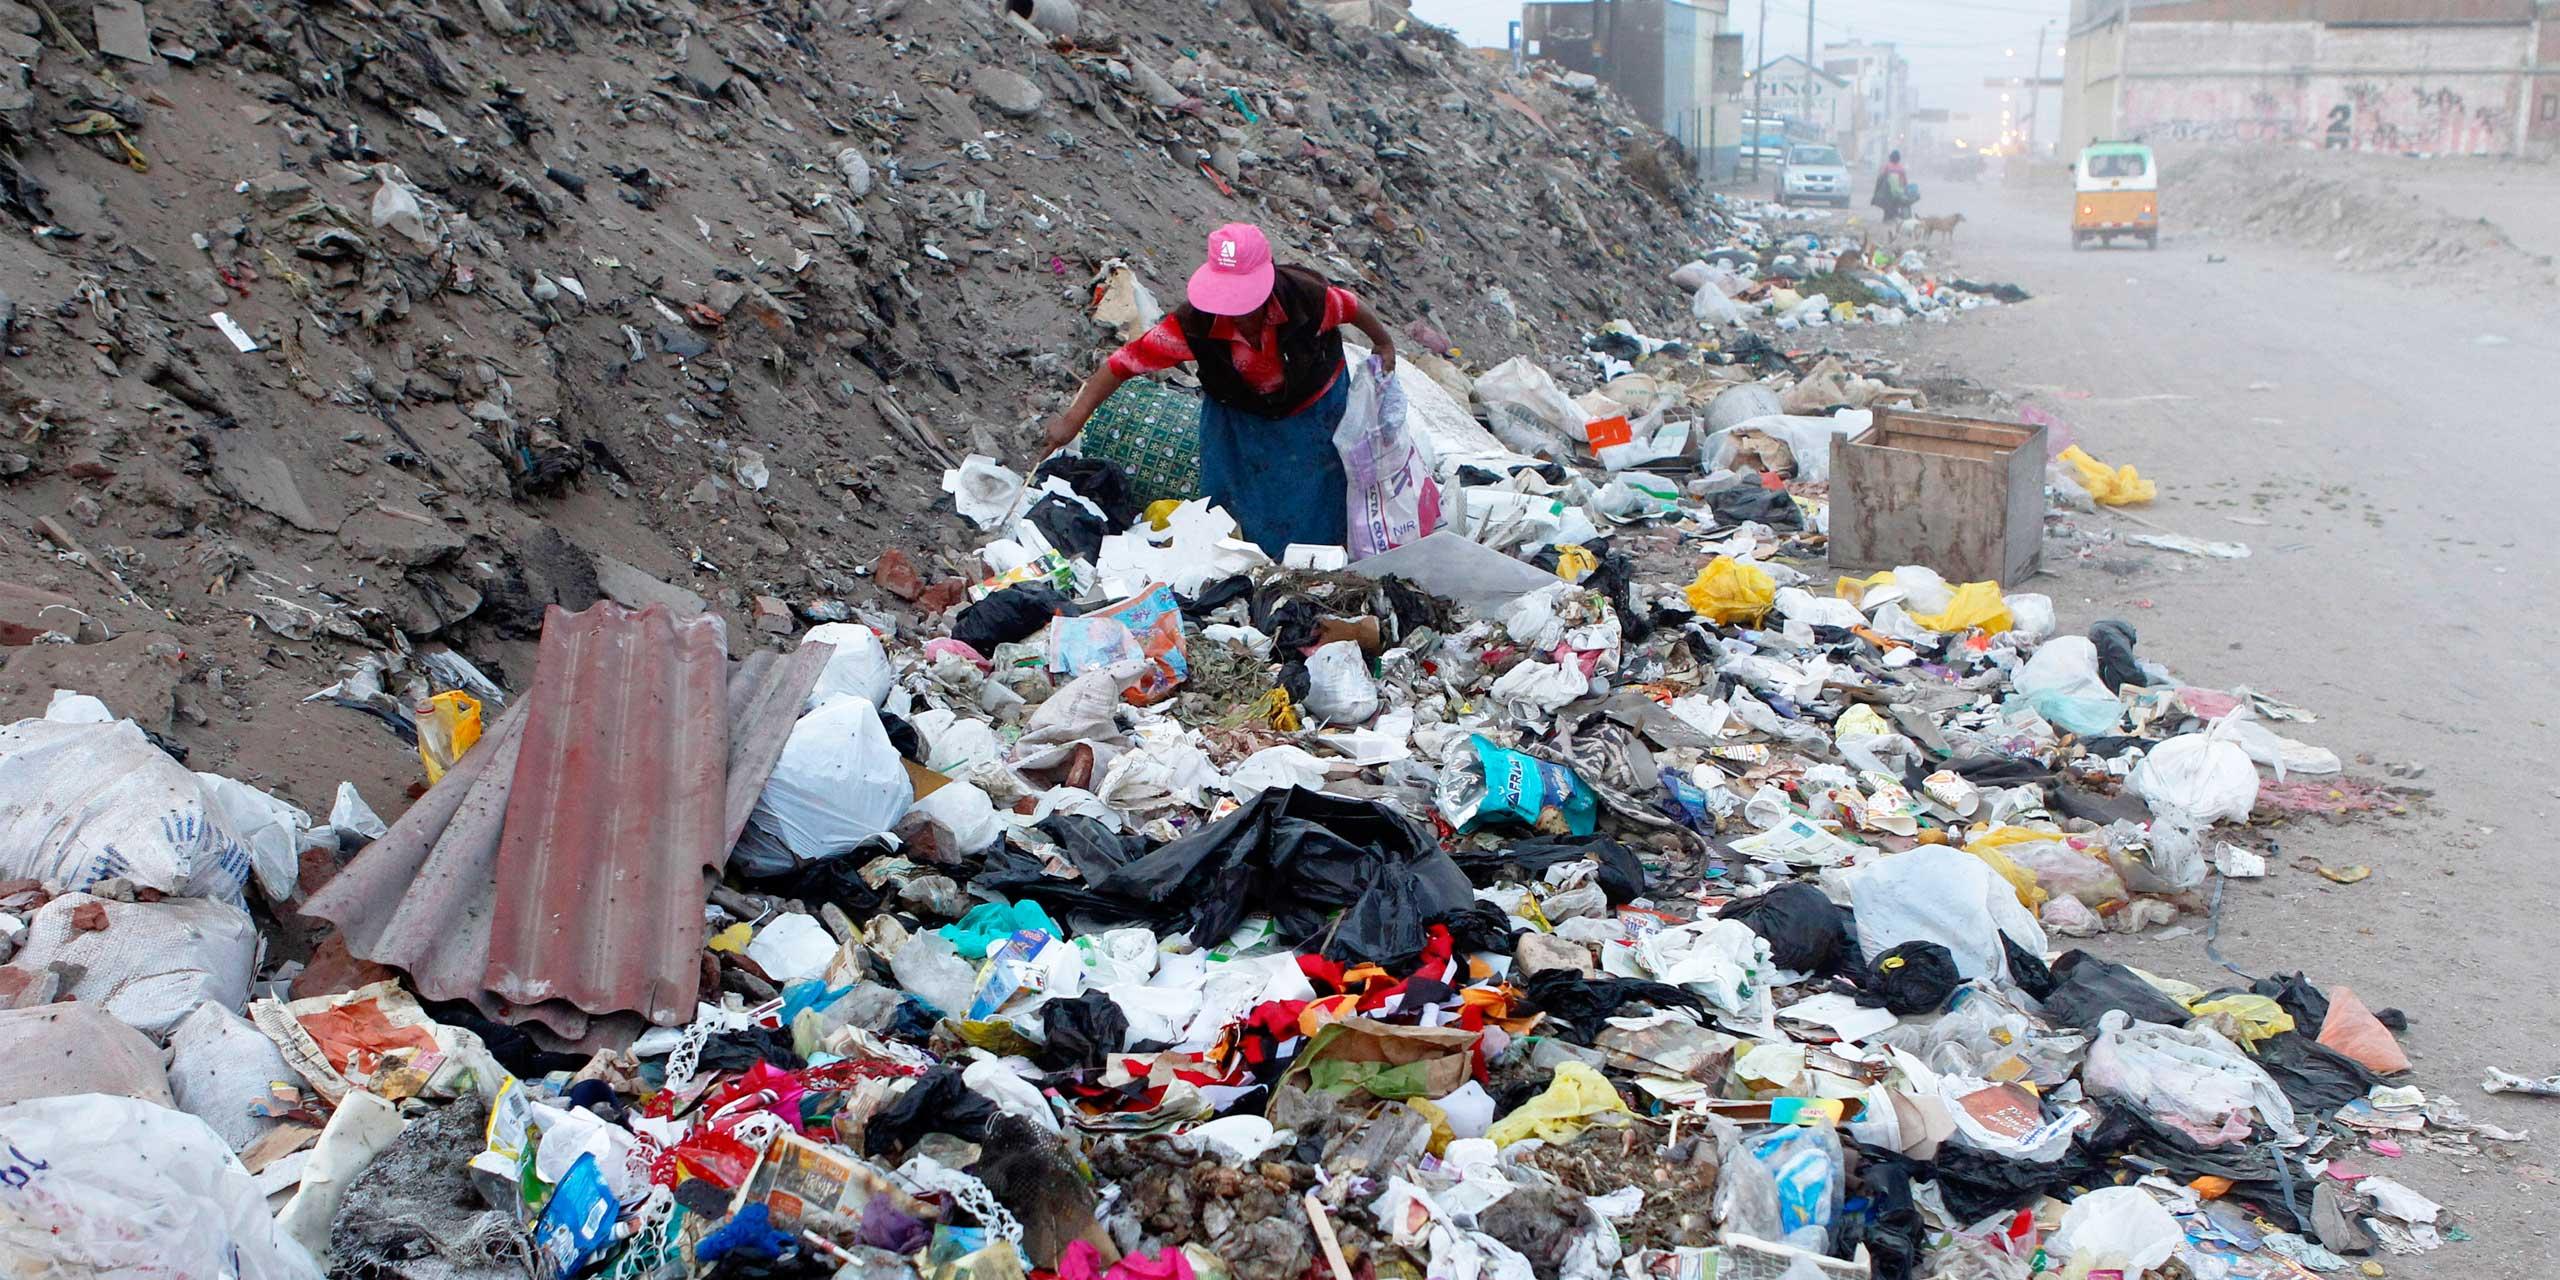 http://staging.skoll.org/wp-content/uploads/2014/03/ciudad-saludable-sl1.jpg